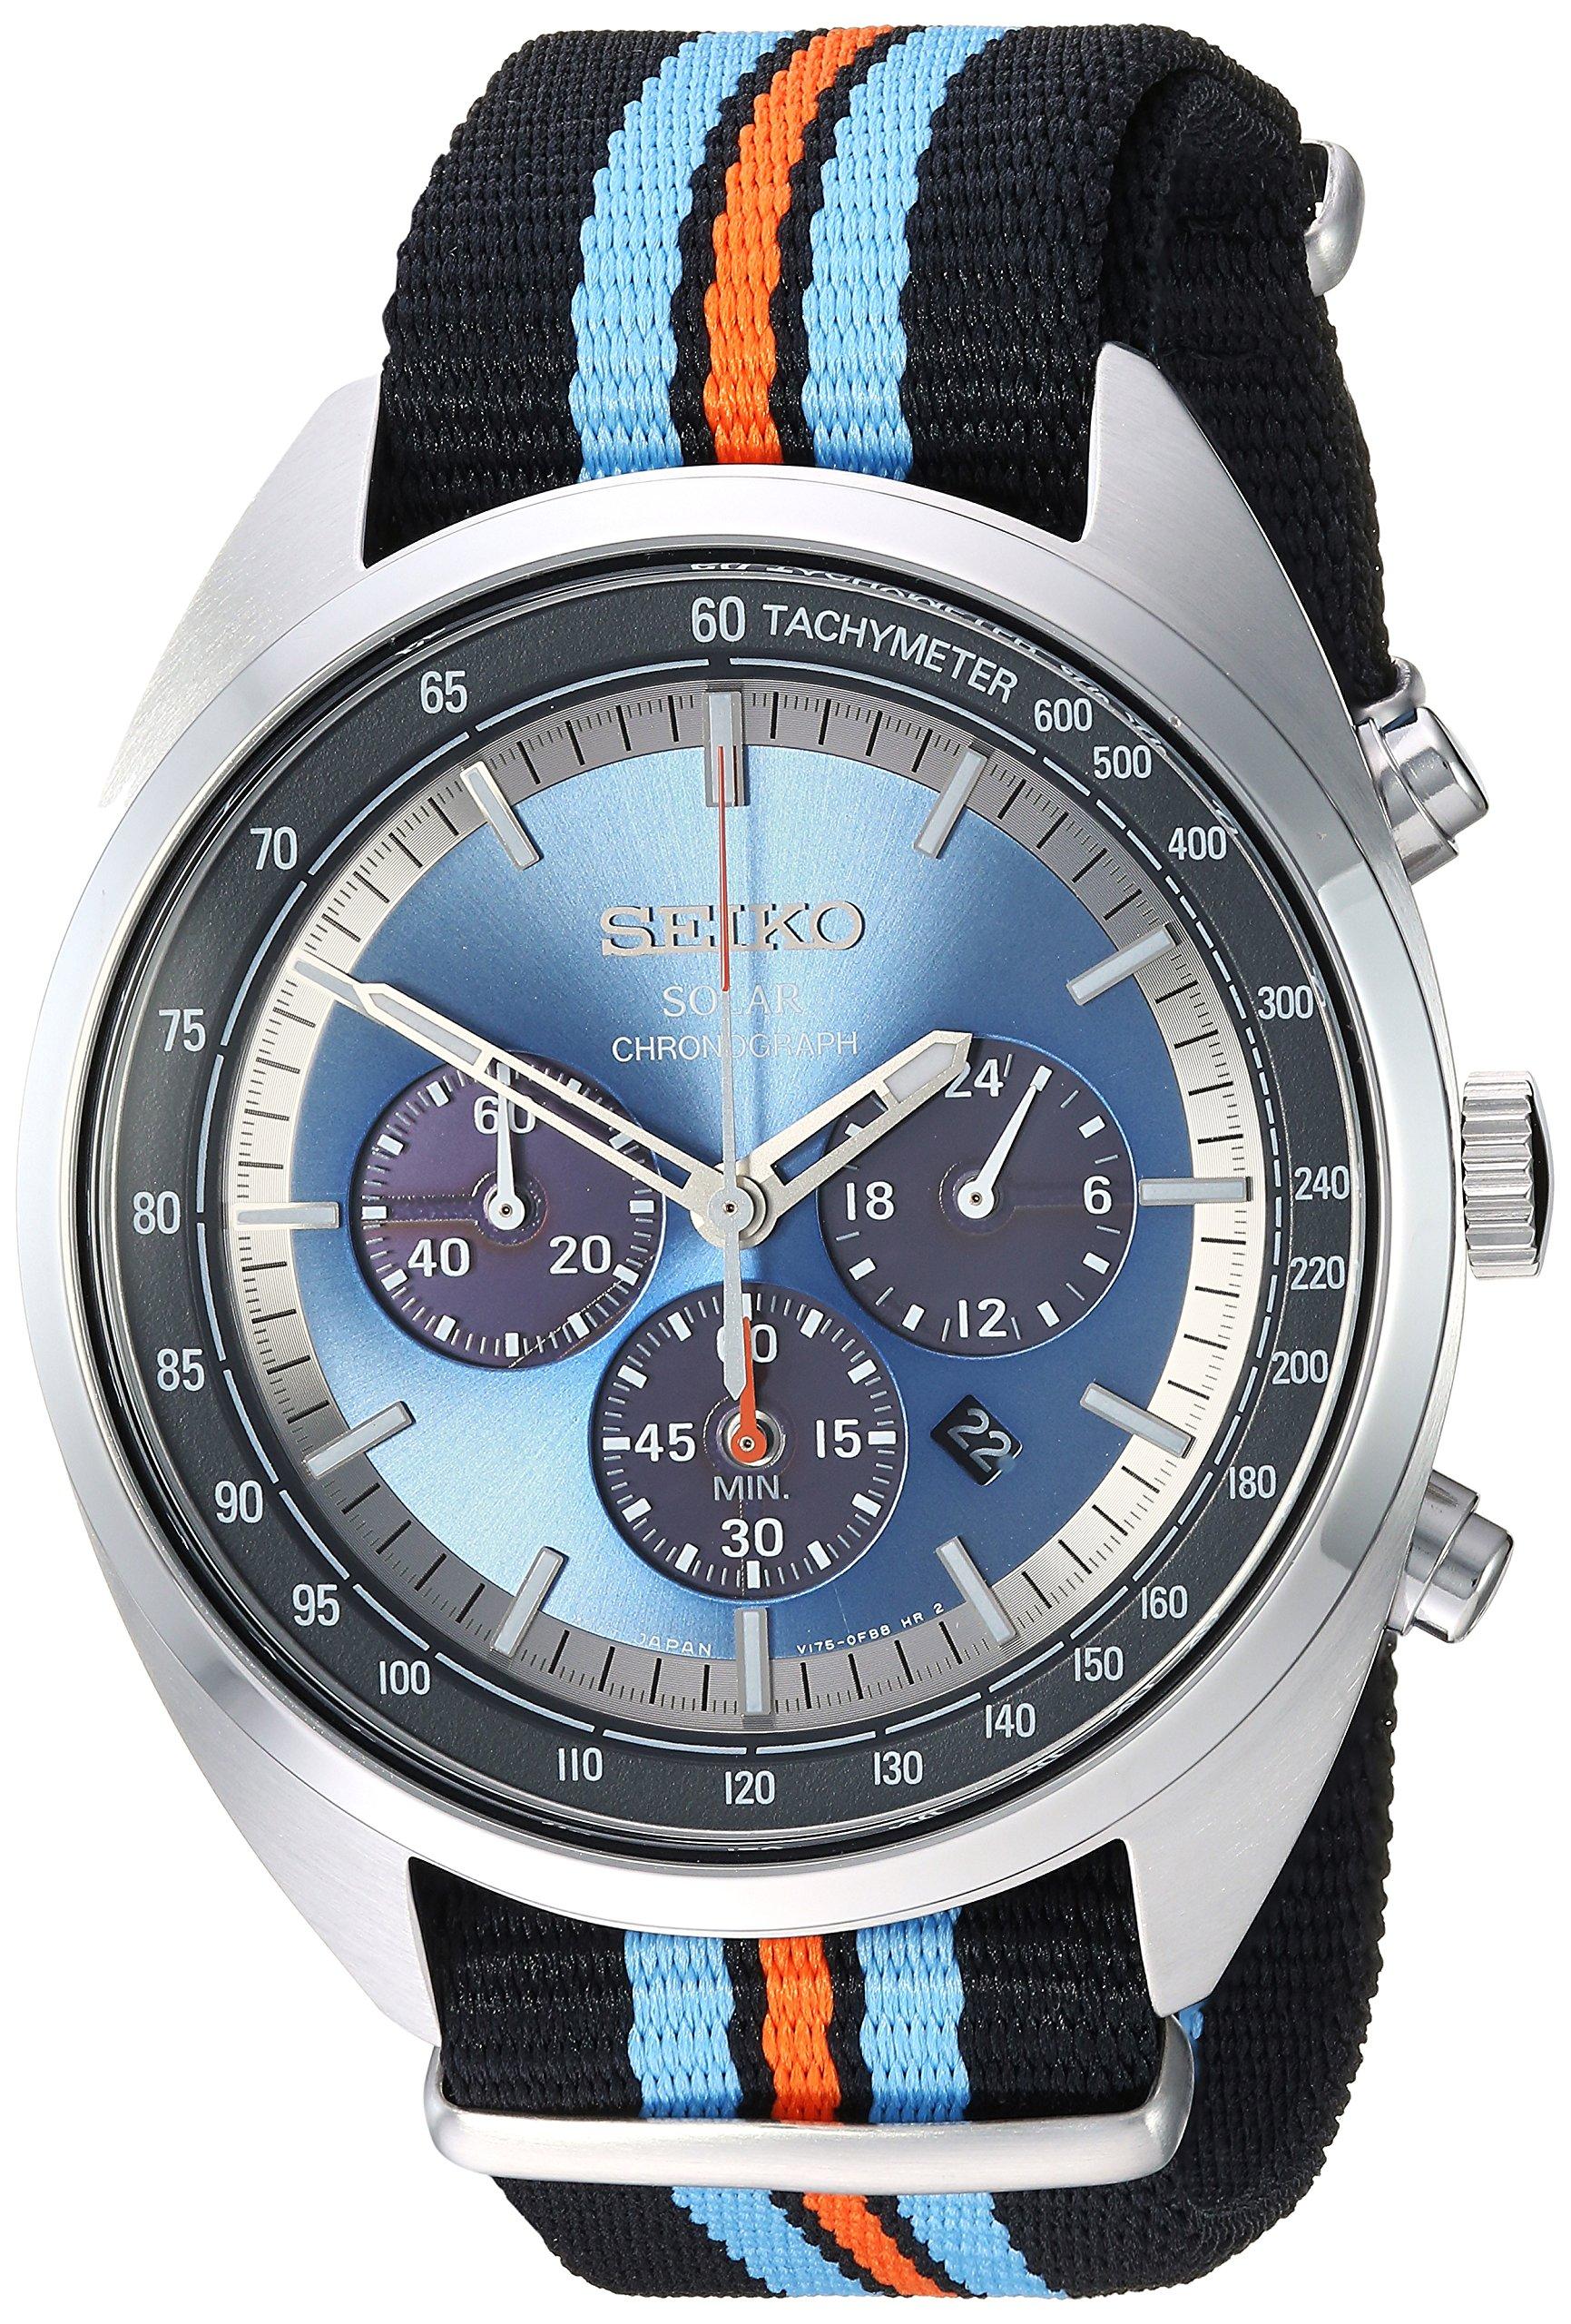 Seiko Men's RECRAFT Series Stainless Steel Japanese-Quartz Watch with Nylon Strap, Black, 21.65 (Model: SSC667) by SEIKO